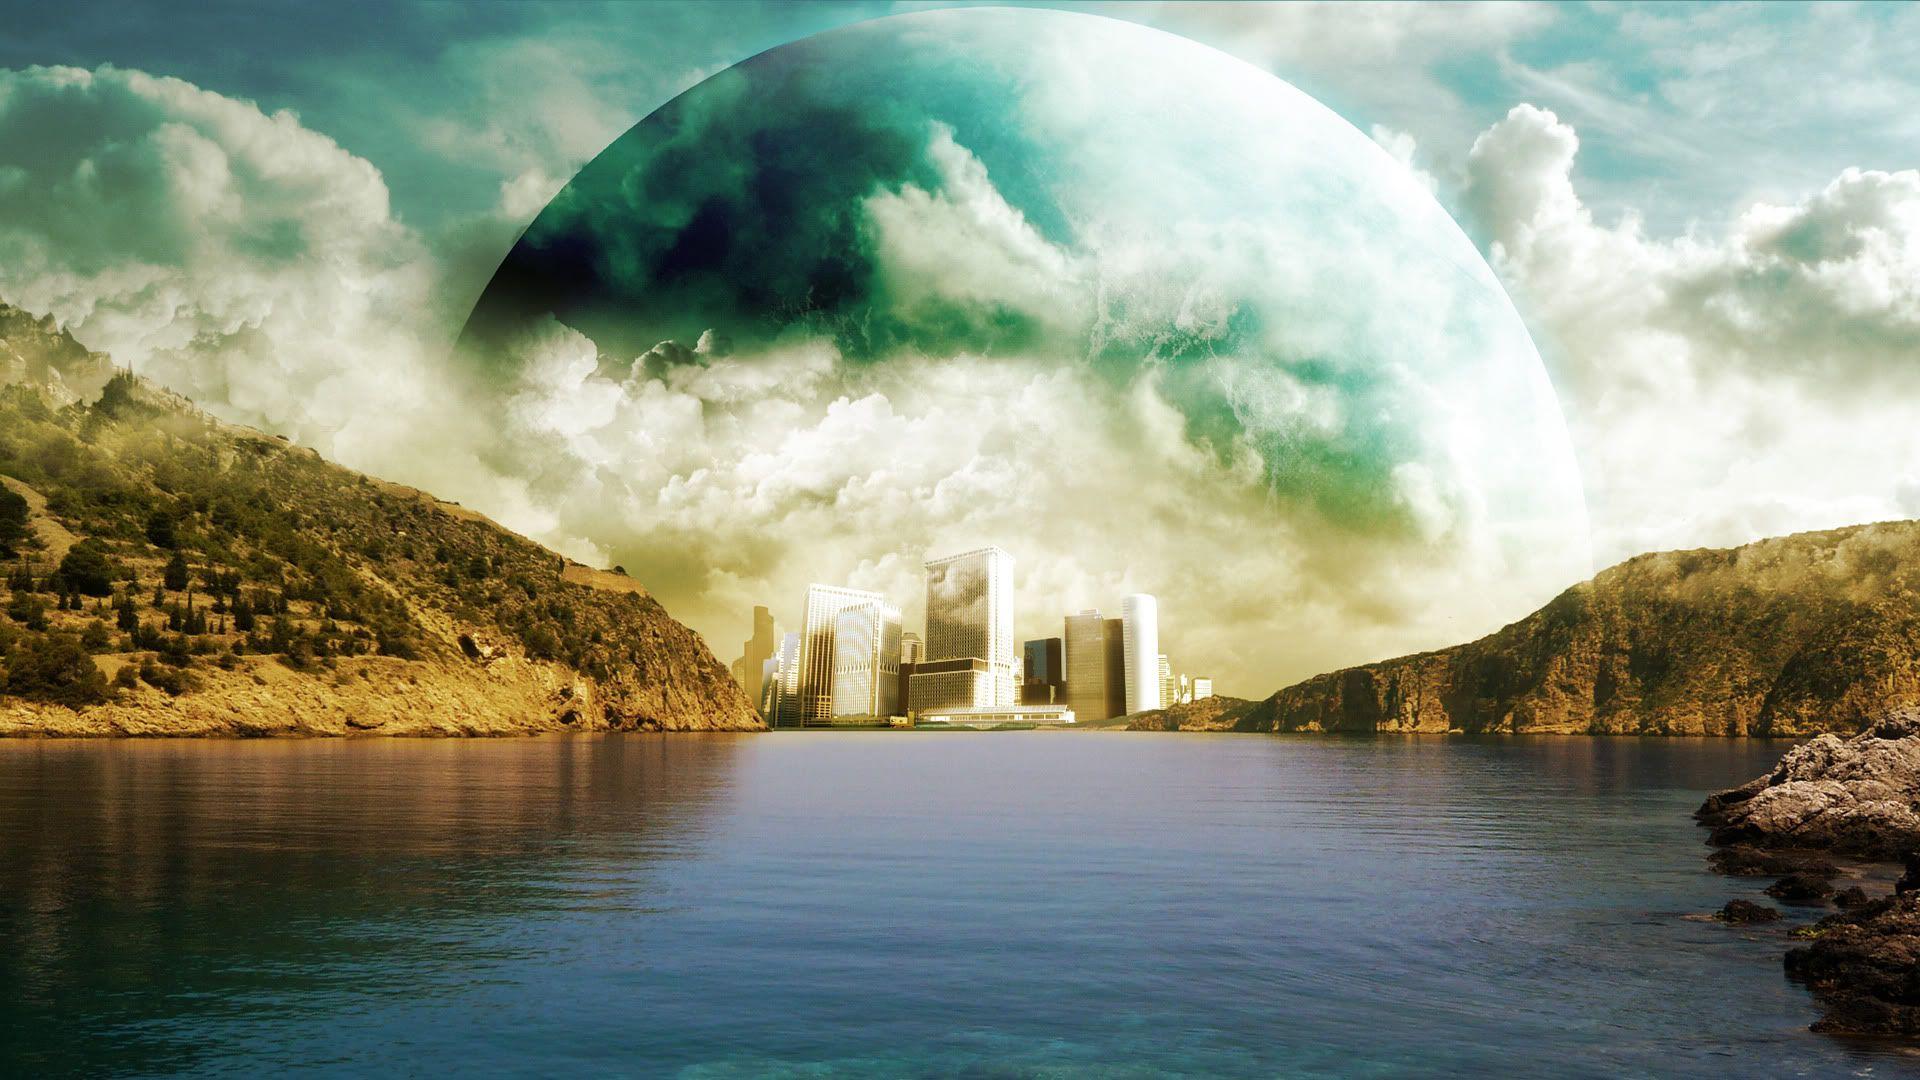 40 Hd Fantasy Ipad Wallpapers: Awesome Fantasy Sci Fi Landscape Wallpaper HD 1